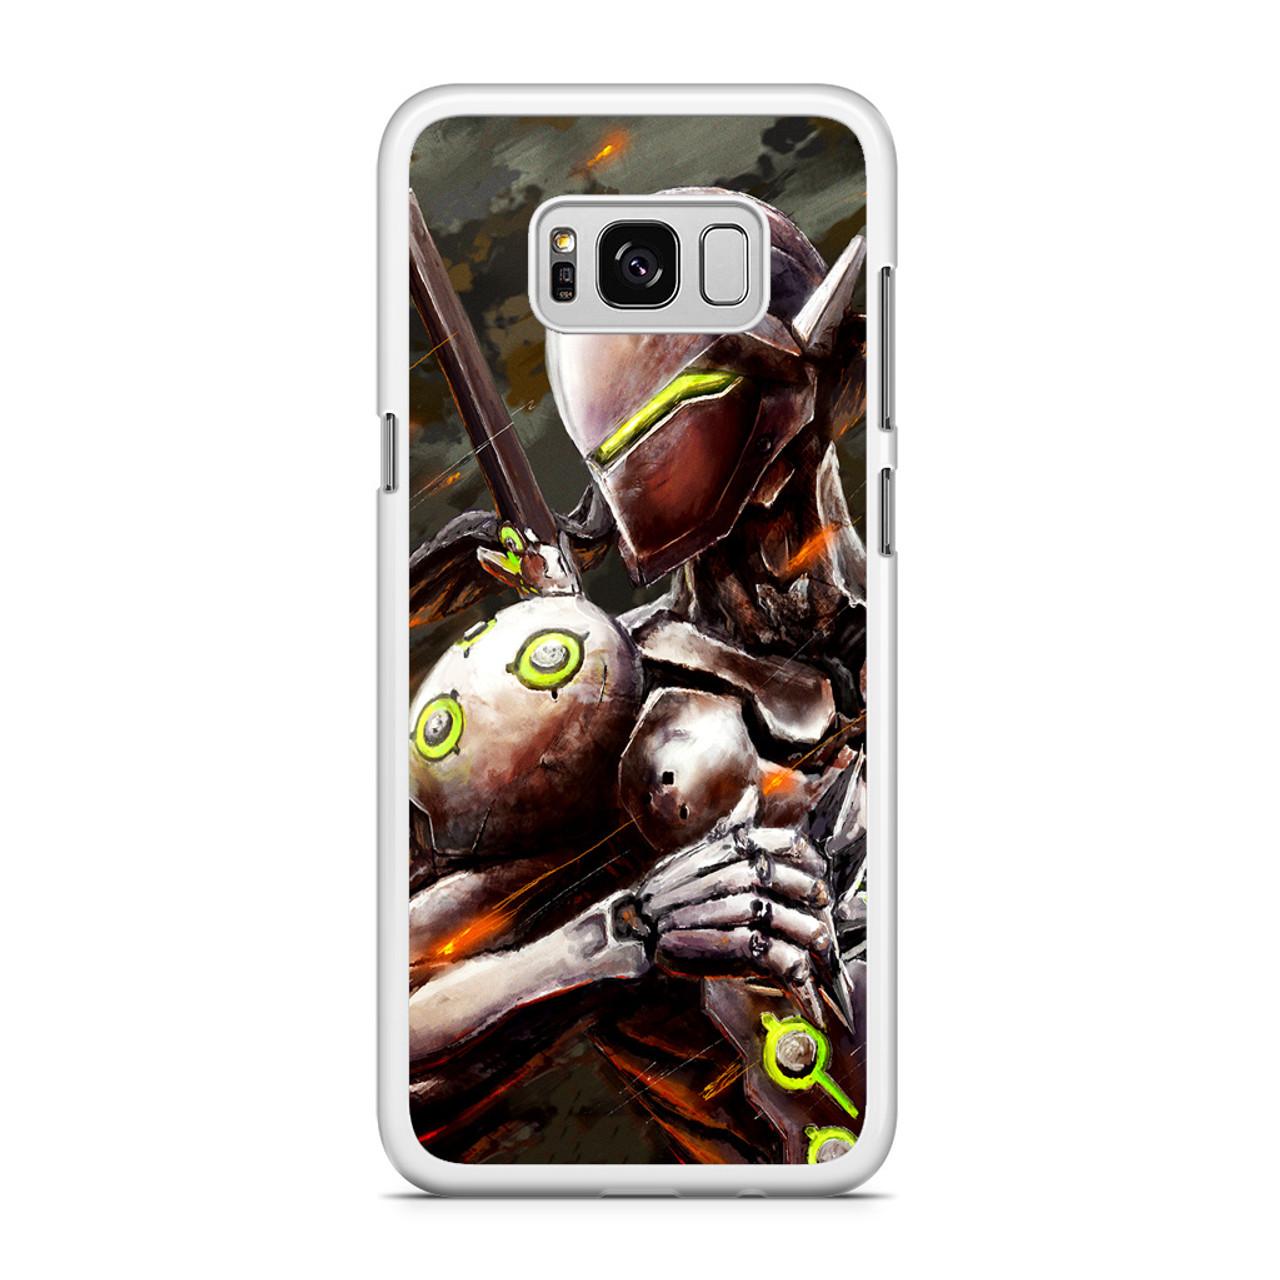 Printed case iPhone 11 Promax,11pro,samsung S20,S20 Ultra genji overwatch case